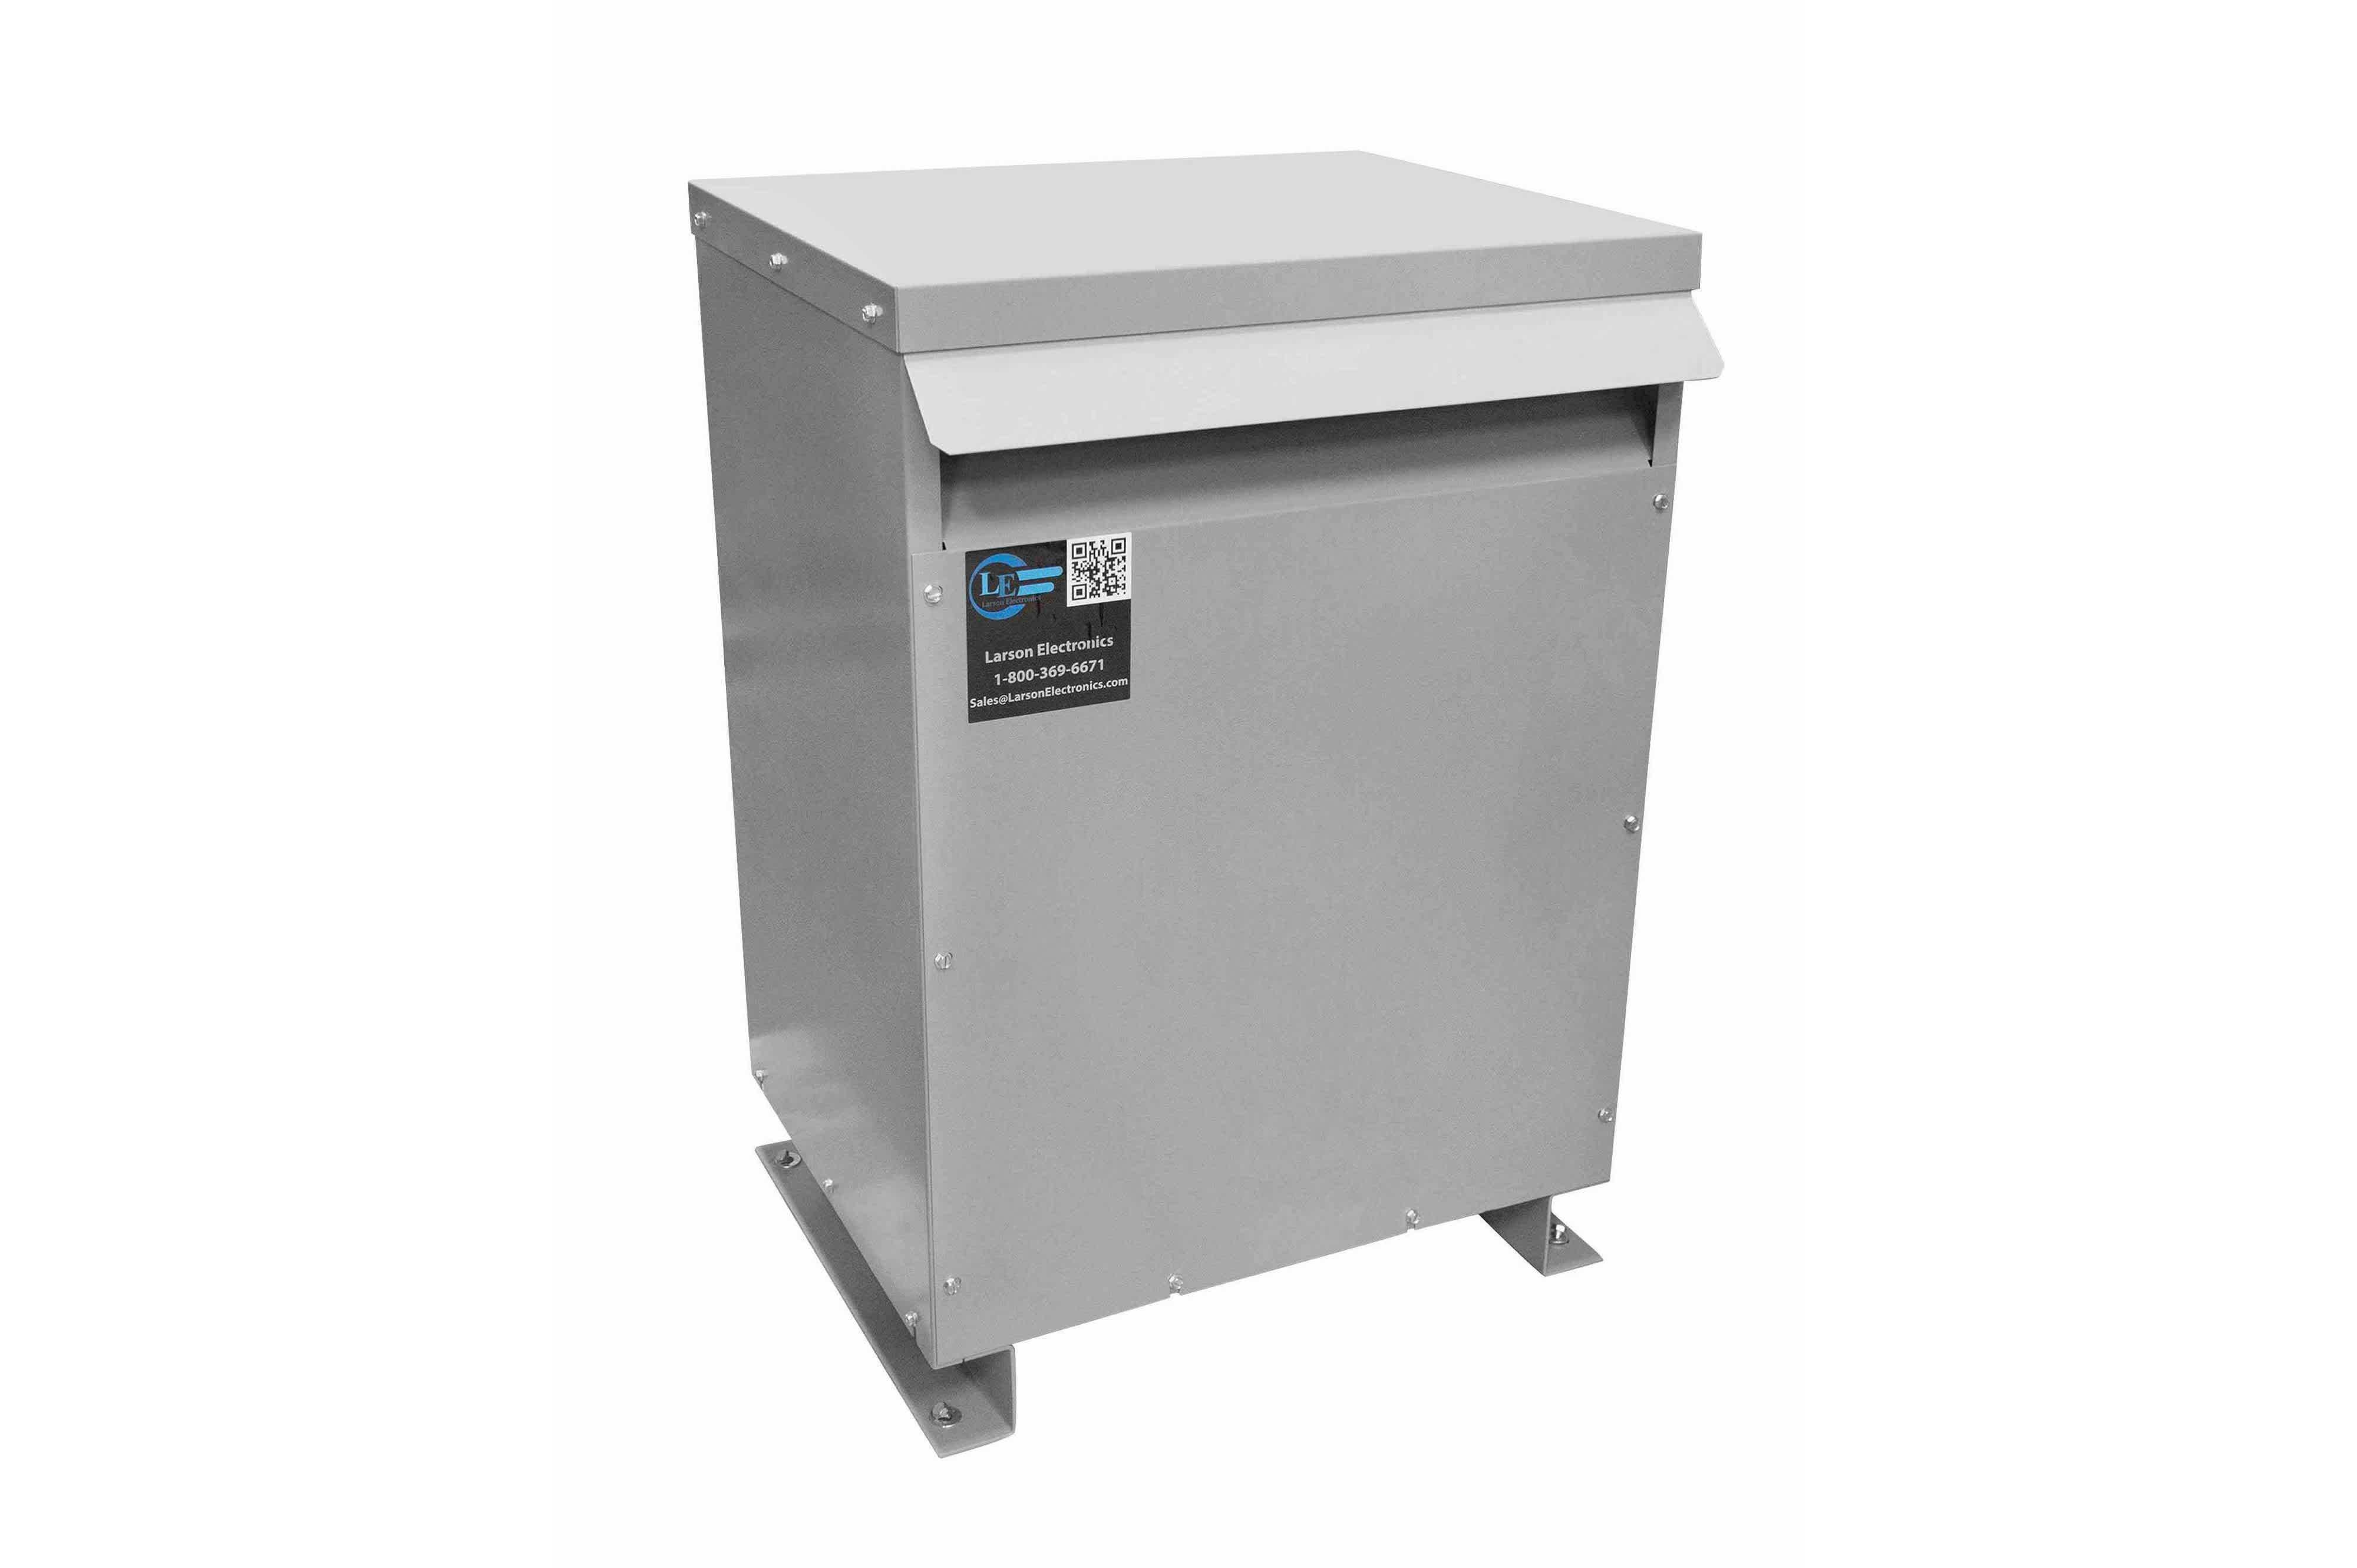 900 kVA 3PH Isolation Transformer, 480V Wye Primary, 240V/120 Delta Secondary, N3R, Ventilated, 60 Hz